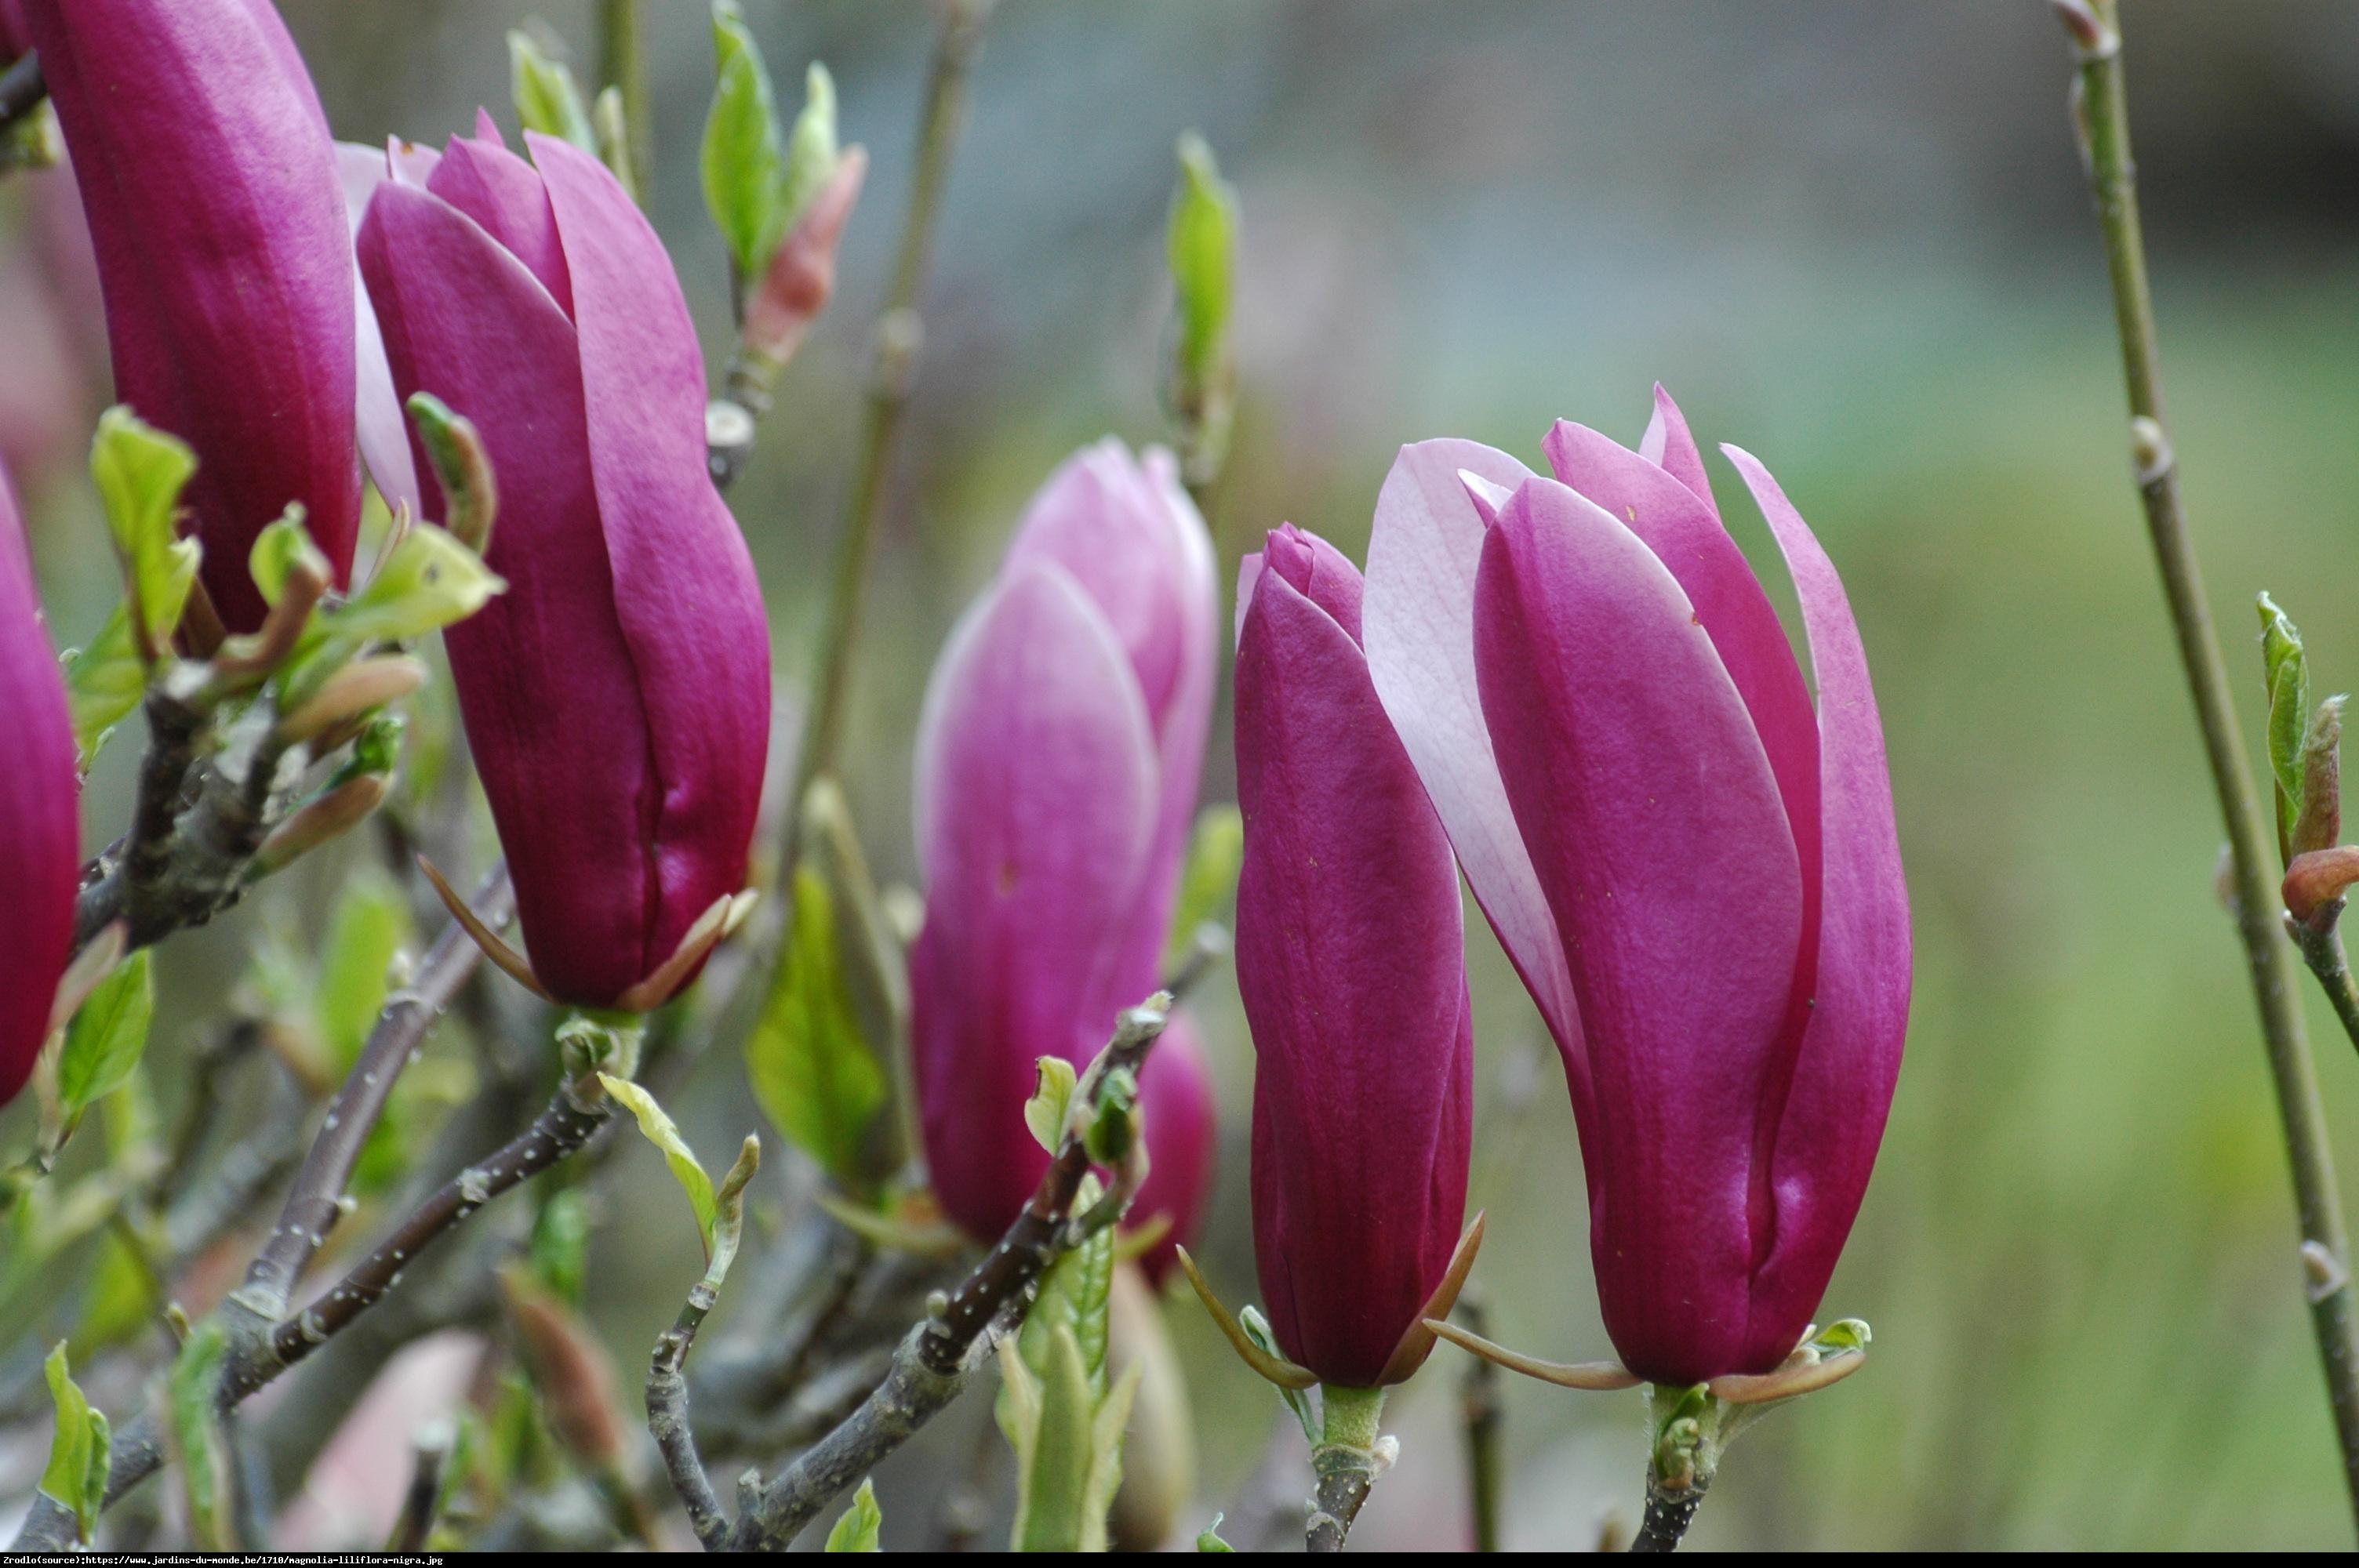 Magnolia Nigra - Magnolia liliflora Nigra